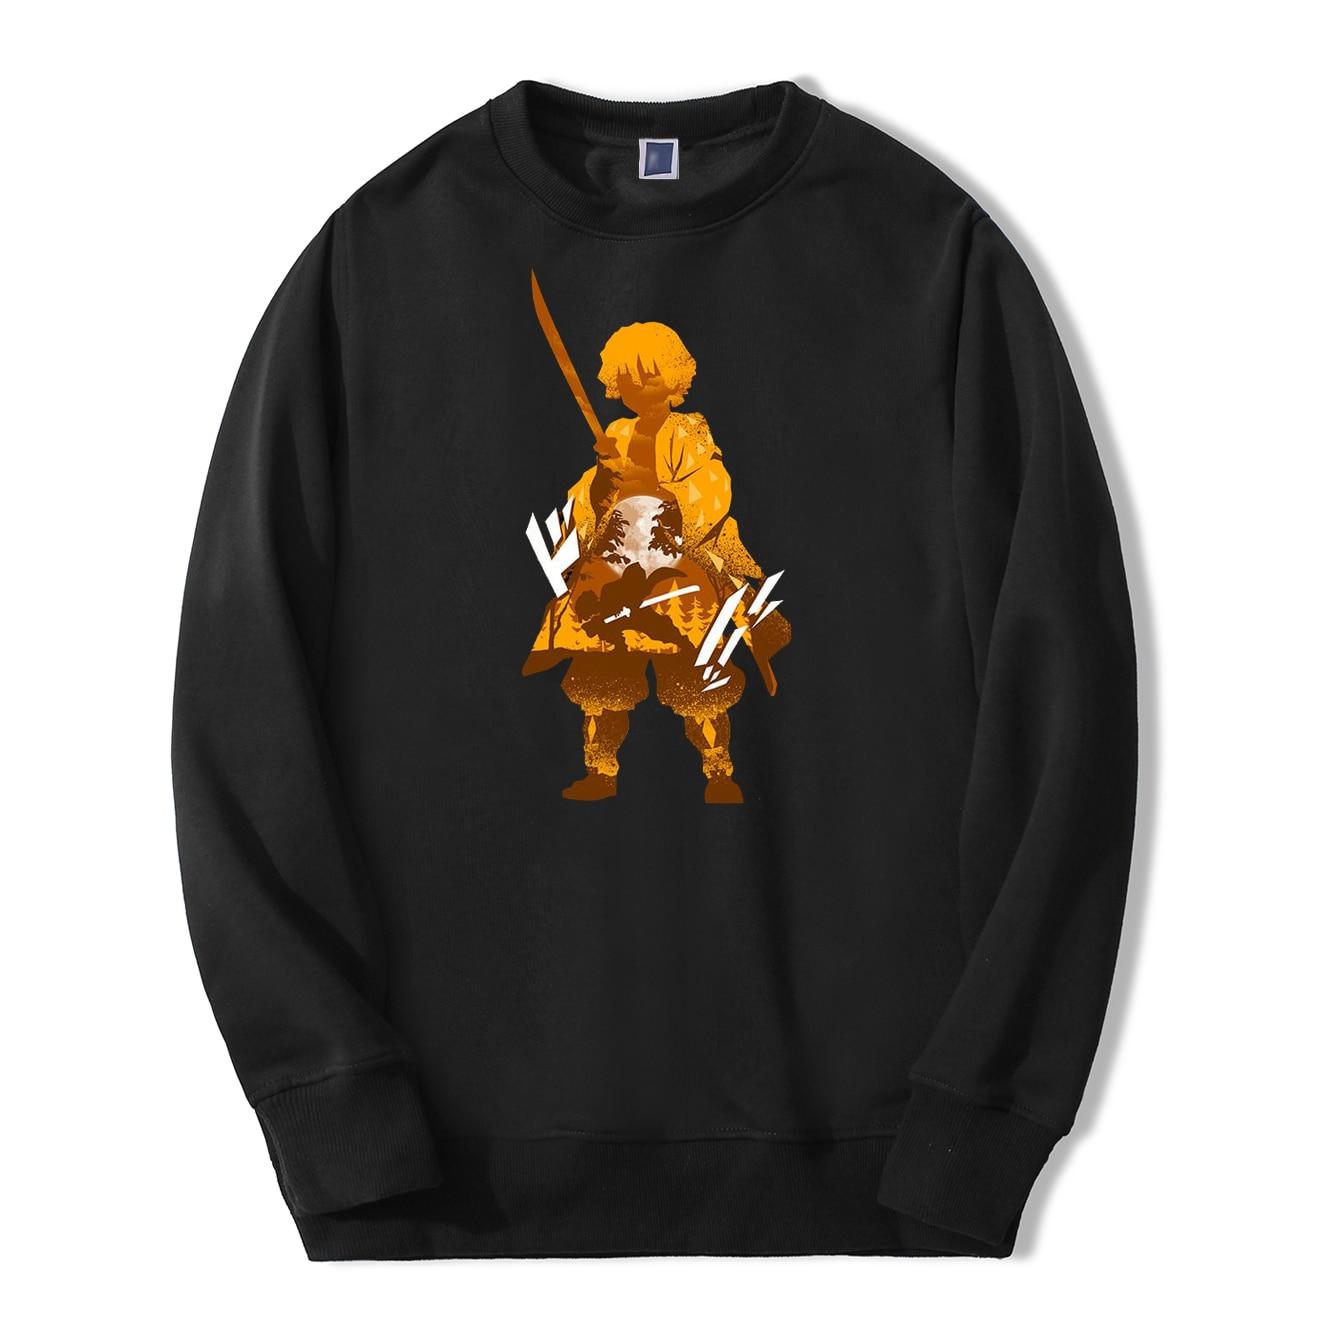 Japan Anime Demon Slayer Men Sweatshirt Hoodies 2020 Spring Autumn Casual Zenitsu Streetwear Loose Fit Hip Hop Fashoin Pullover